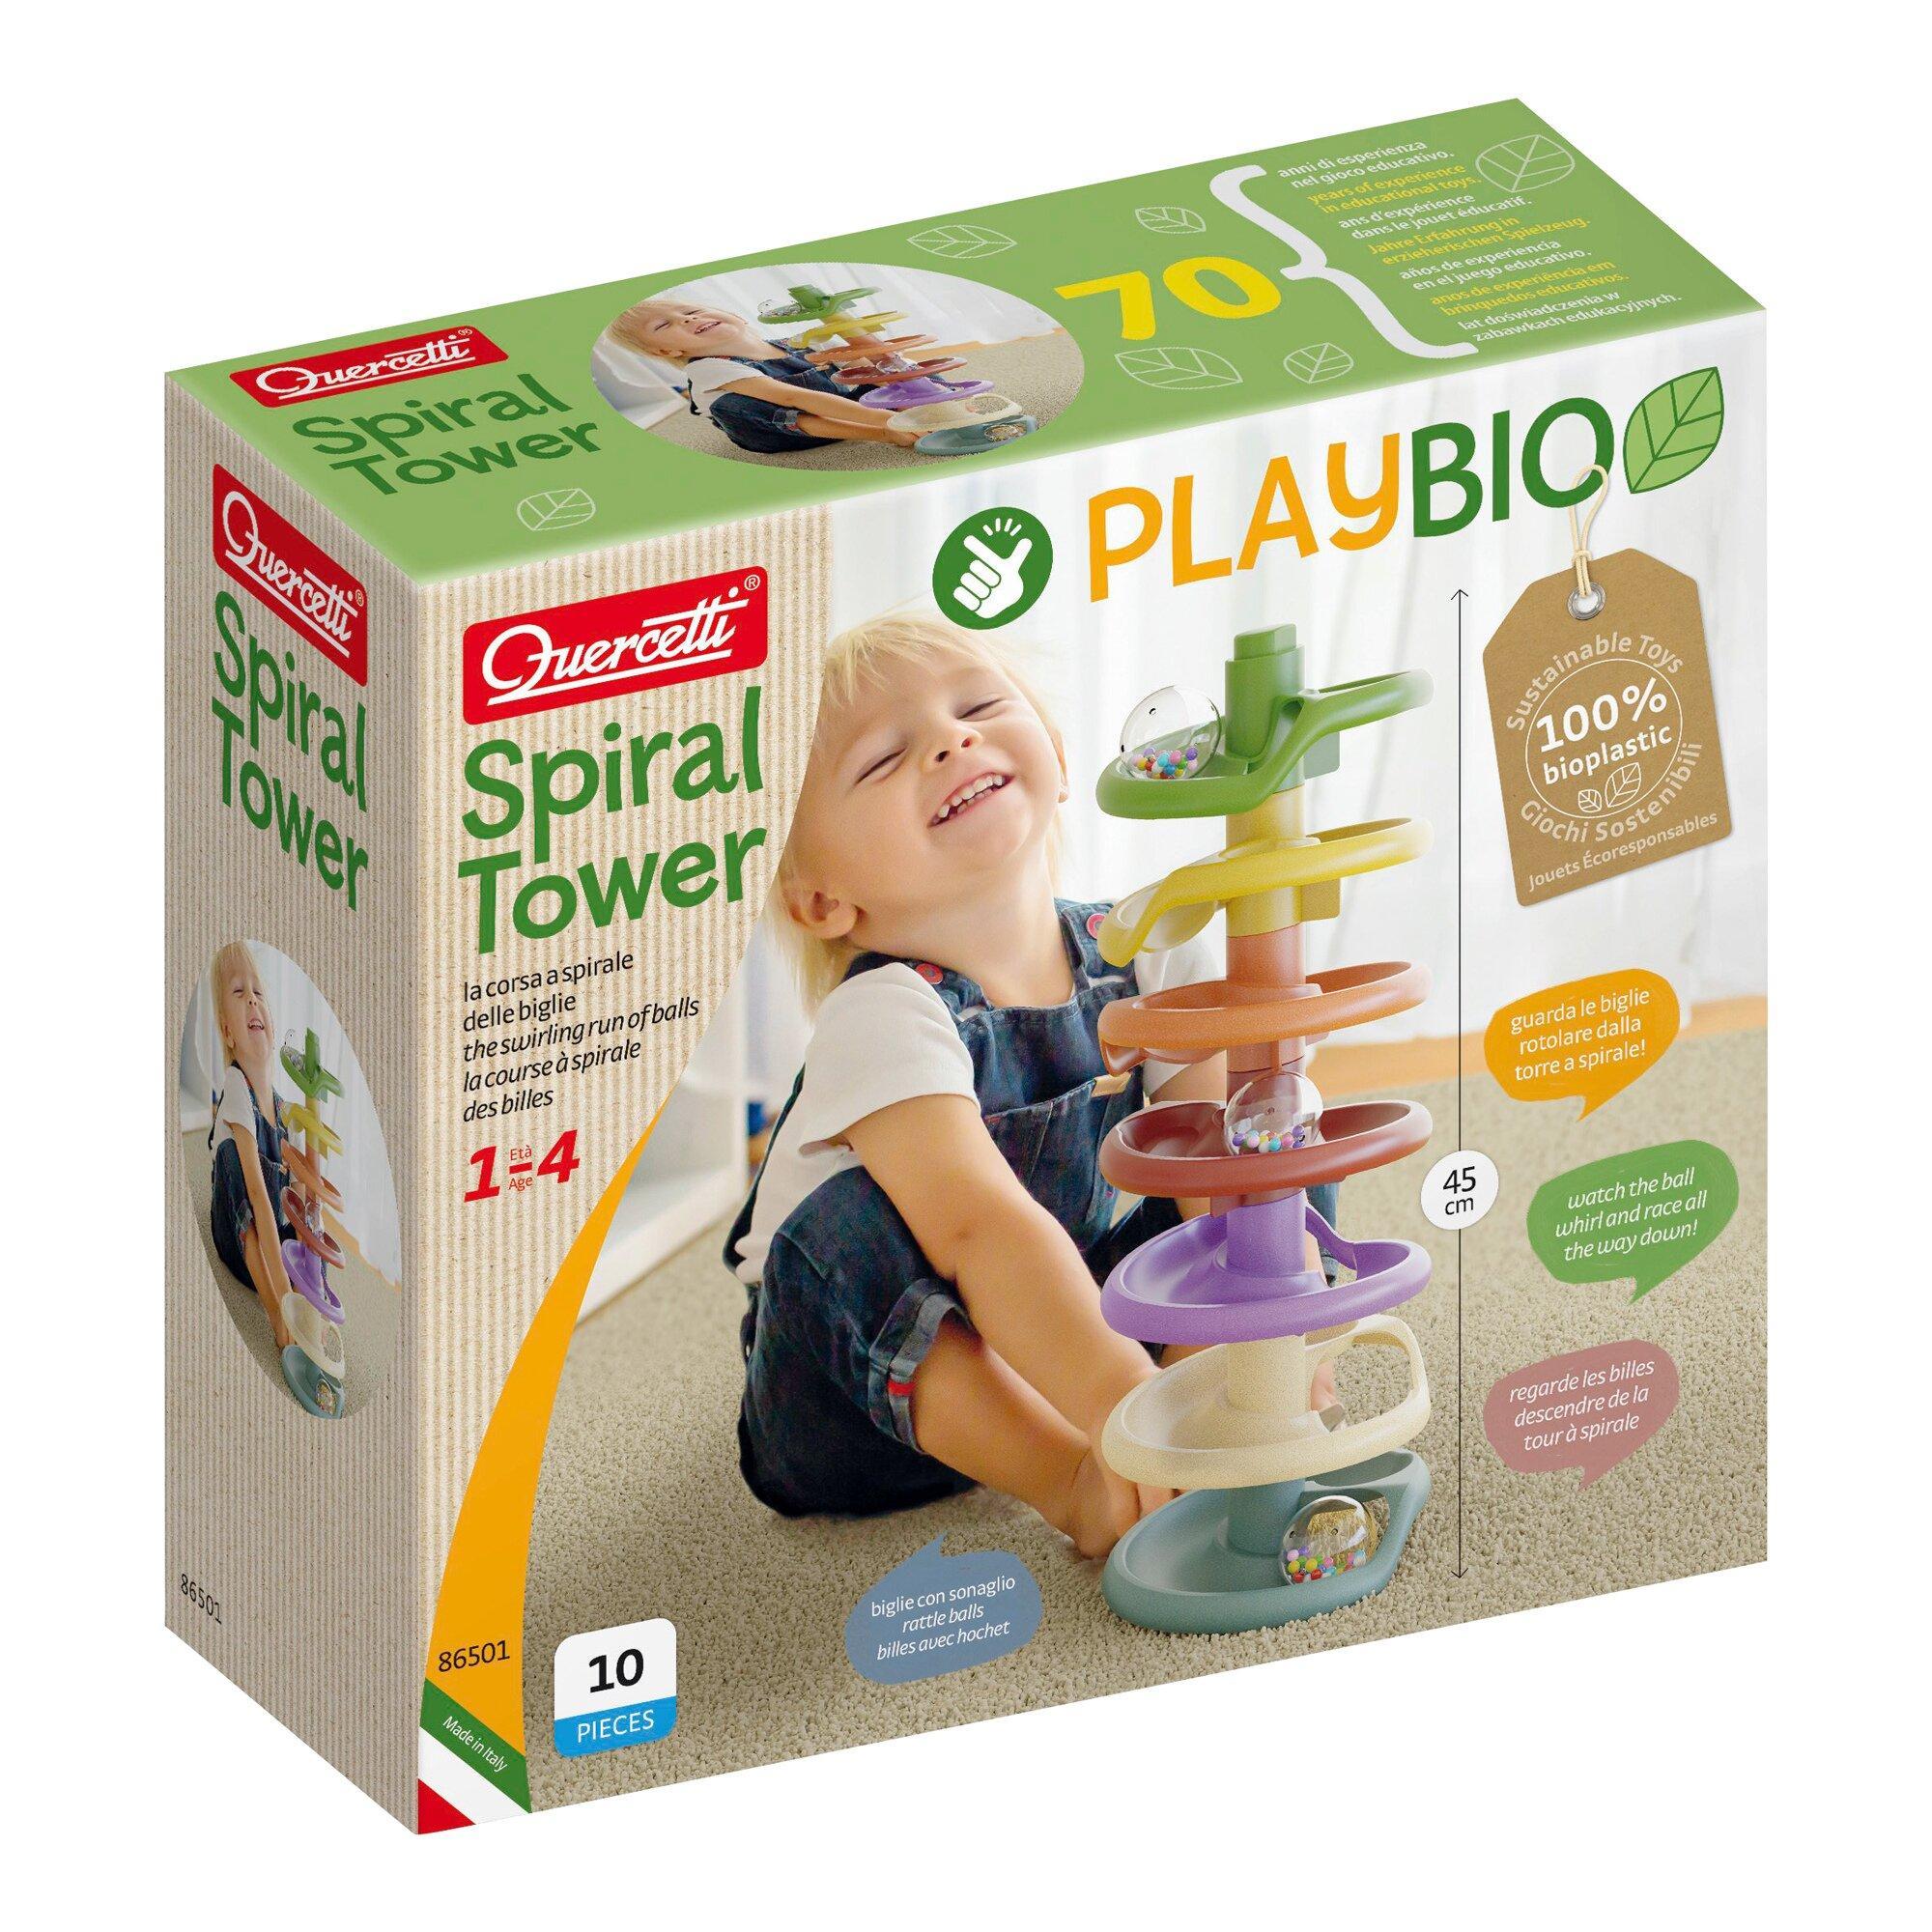 Kugelbahn Spiral Tower Play Bio